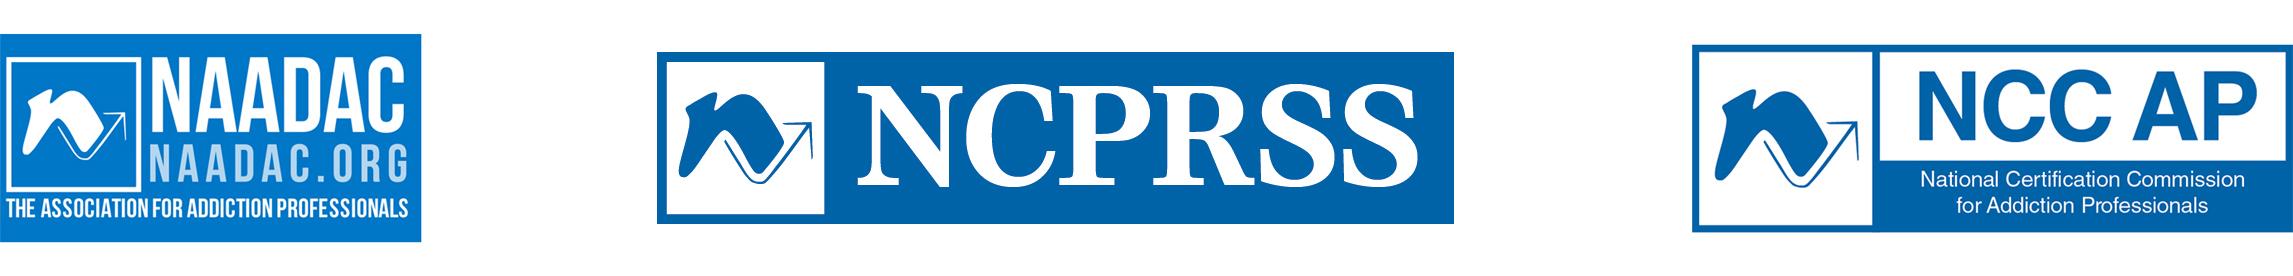 NCPRSS Code of Ethics